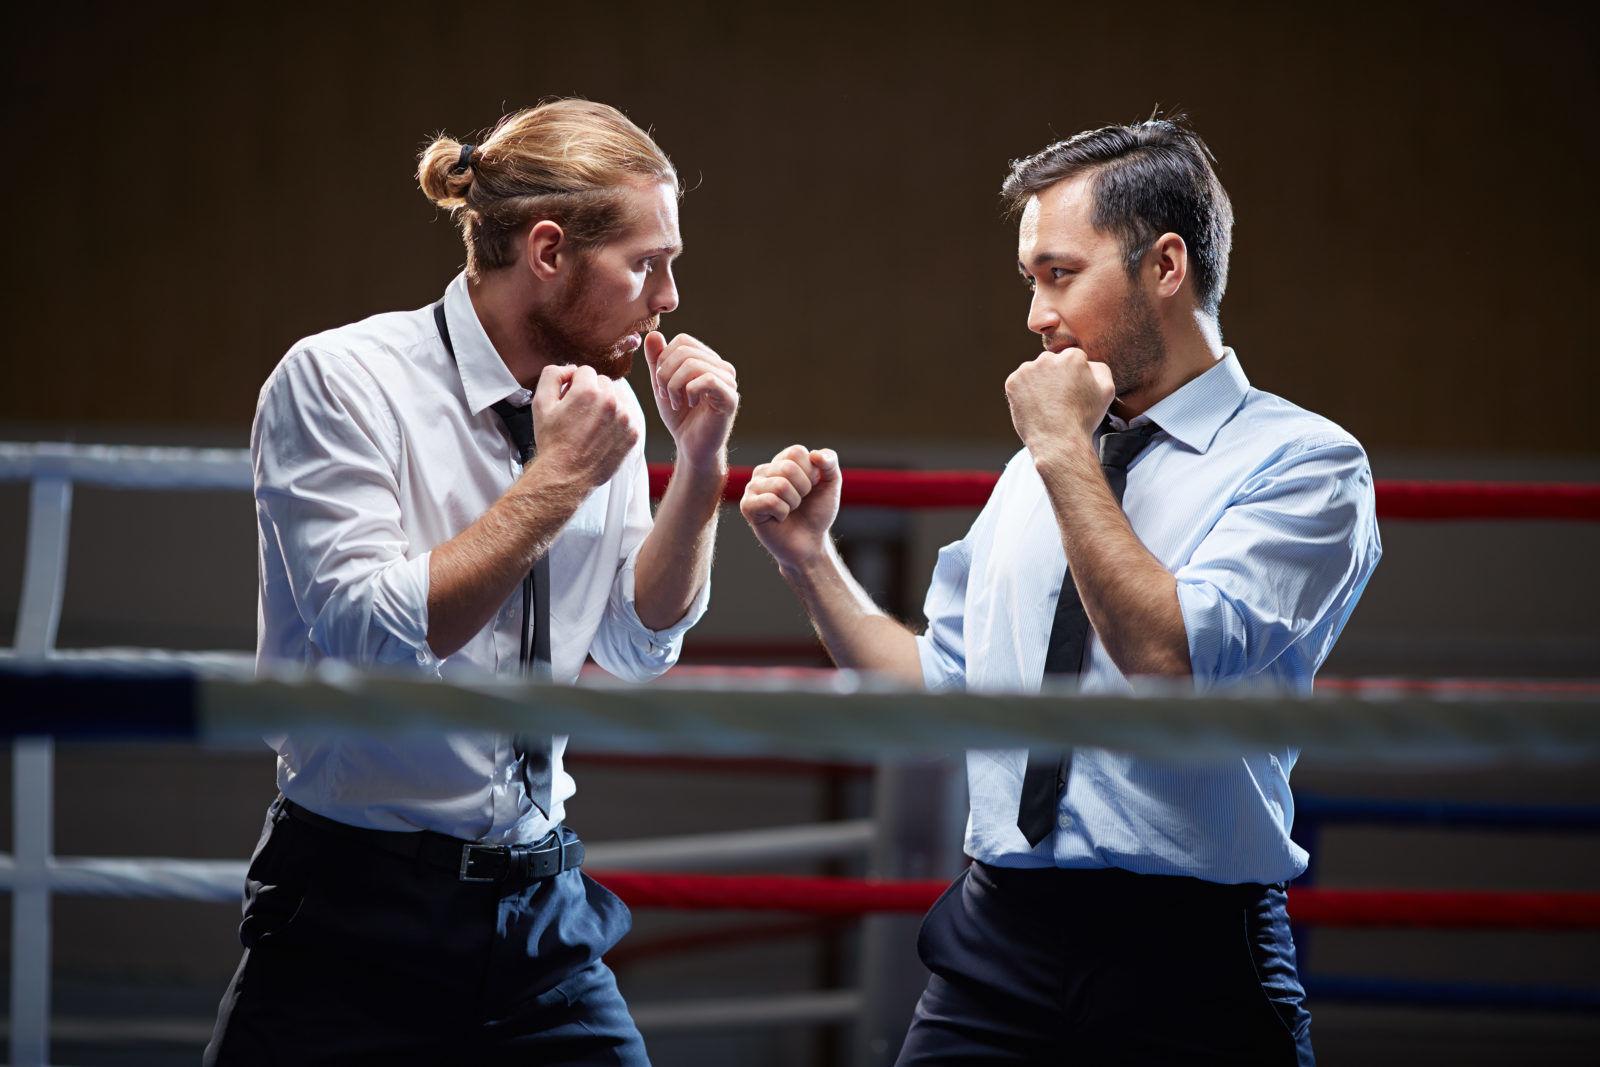 White Collar Fight